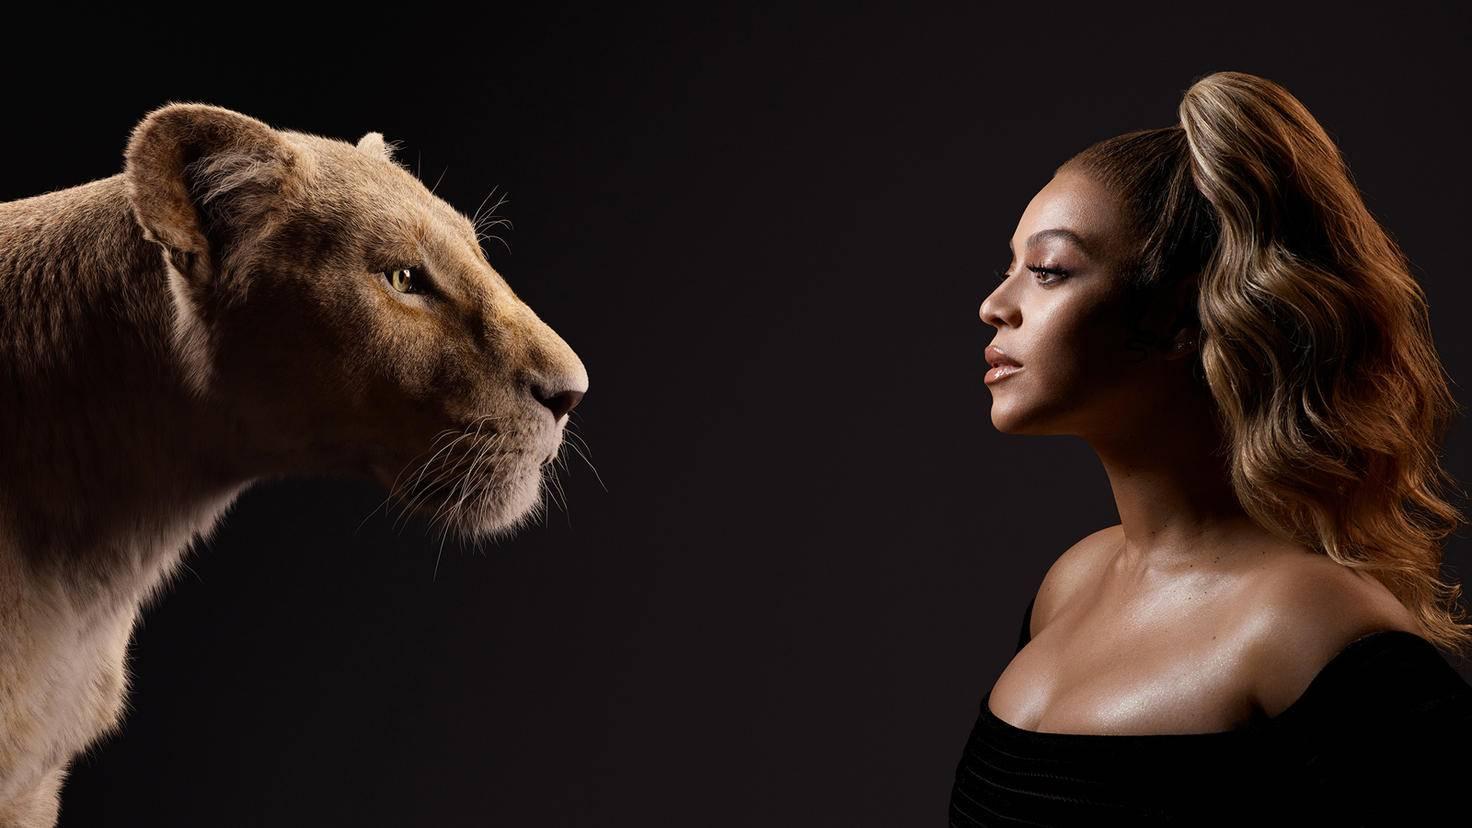 Beyoncé spricht die erwachsene Löwin Nala.